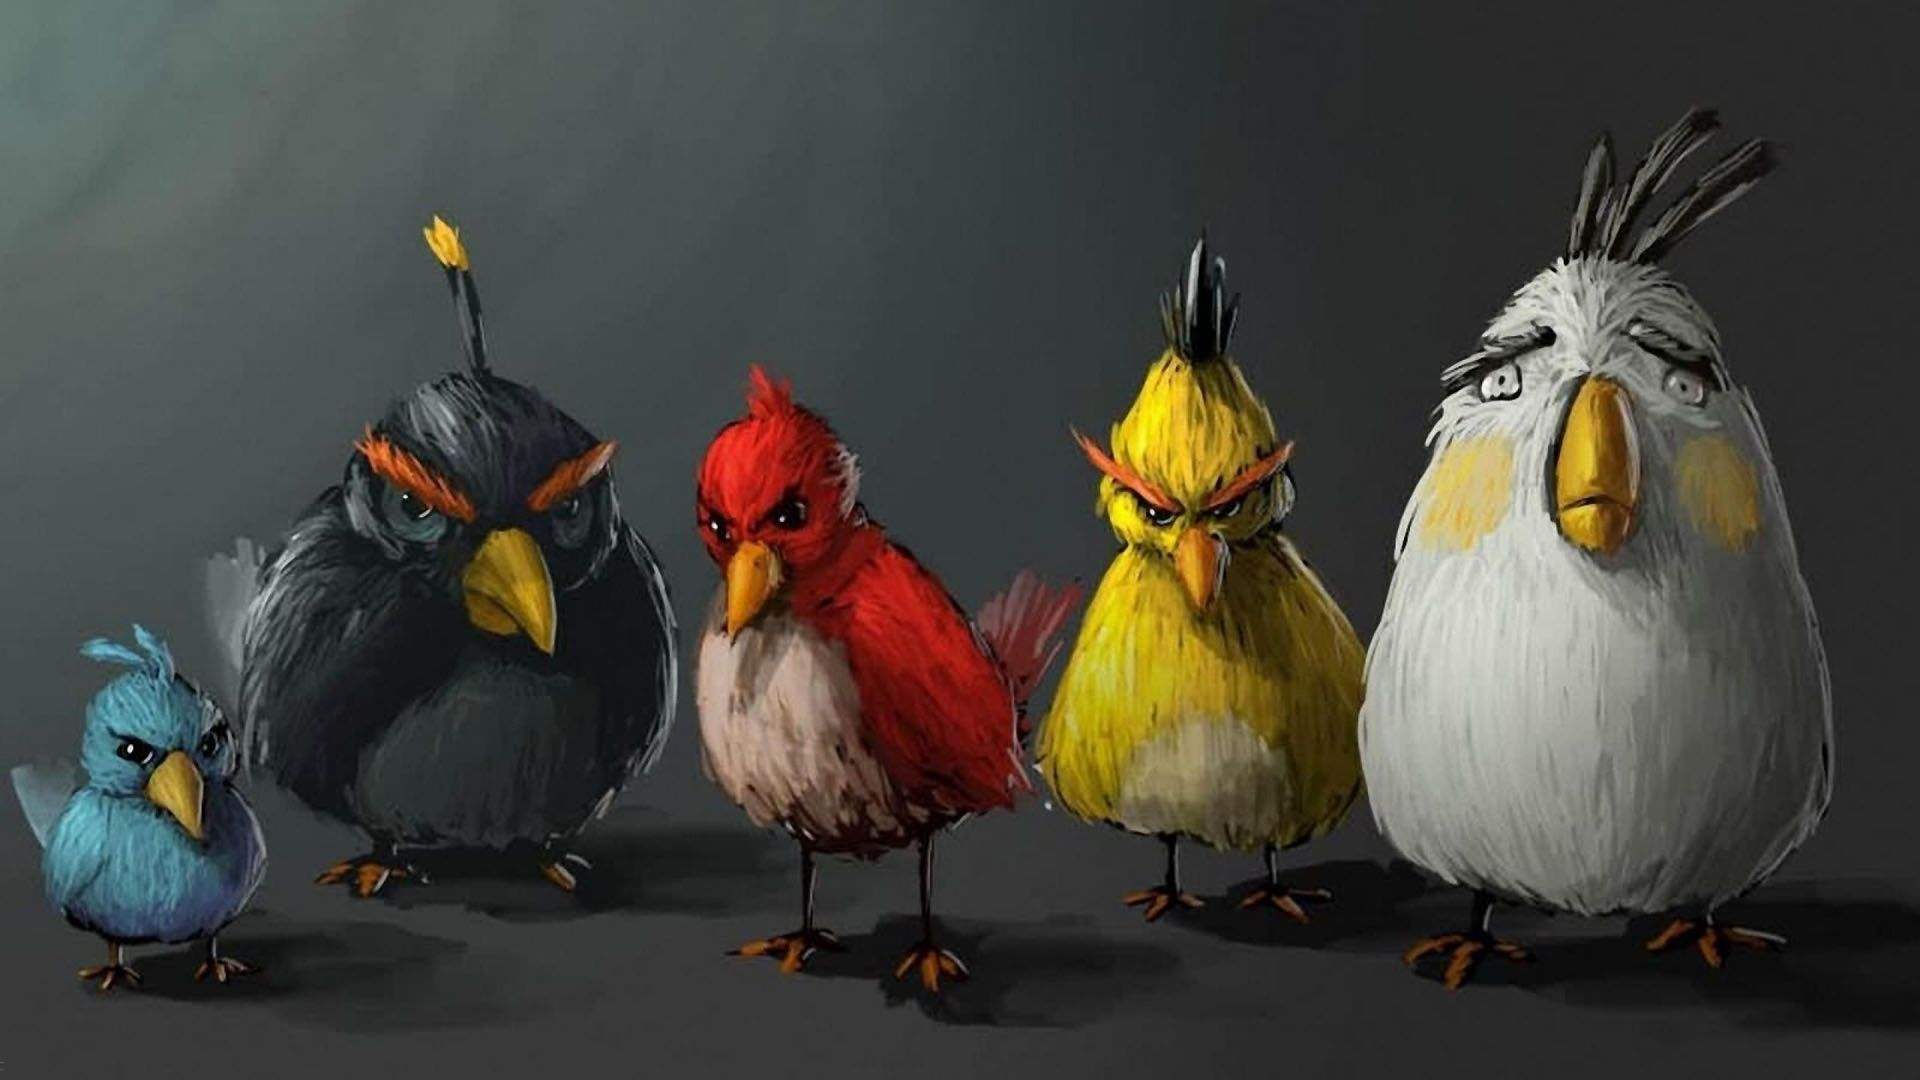 Paint art angry birds hd wallpaper hd wallpapers hd wide wallpaper paint art angry birds hd wallpaper hd wallpapers hd wide wallpaper for widescreen voltagebd Gallery